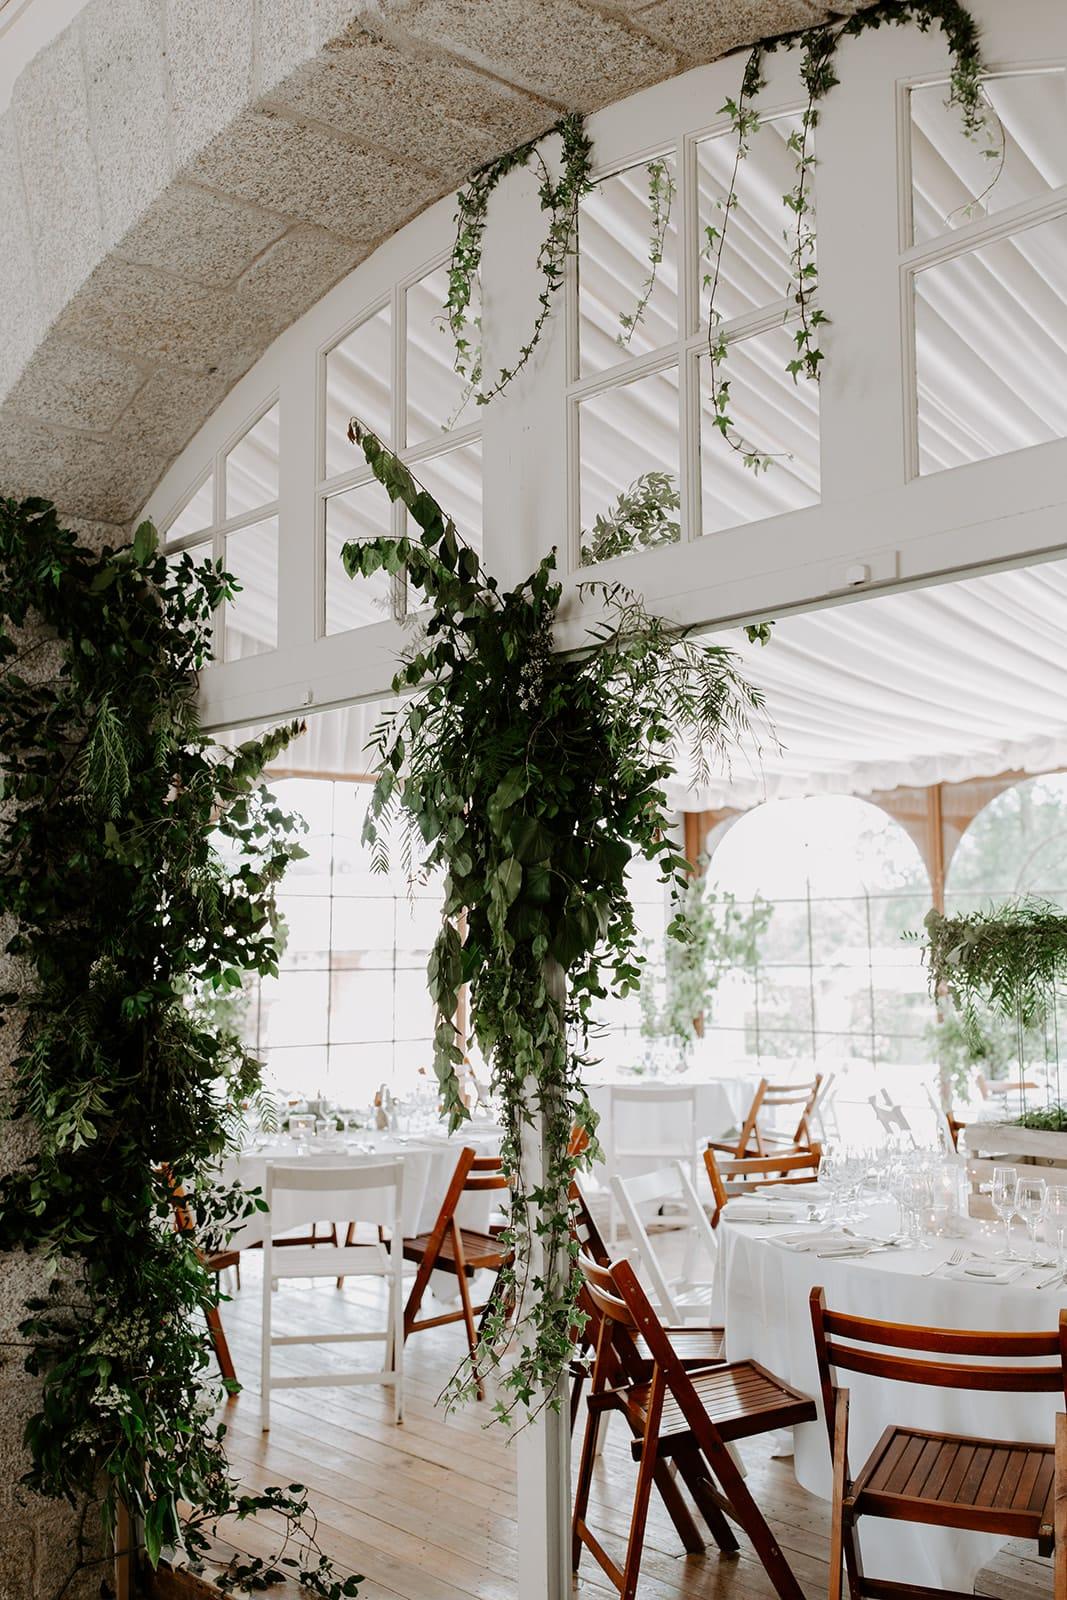 mariage_chateau_la_flocelliere_vendee_flavie_nelly_photographe-39-obonheurdesdames-decoration-mariage-location-vegetal